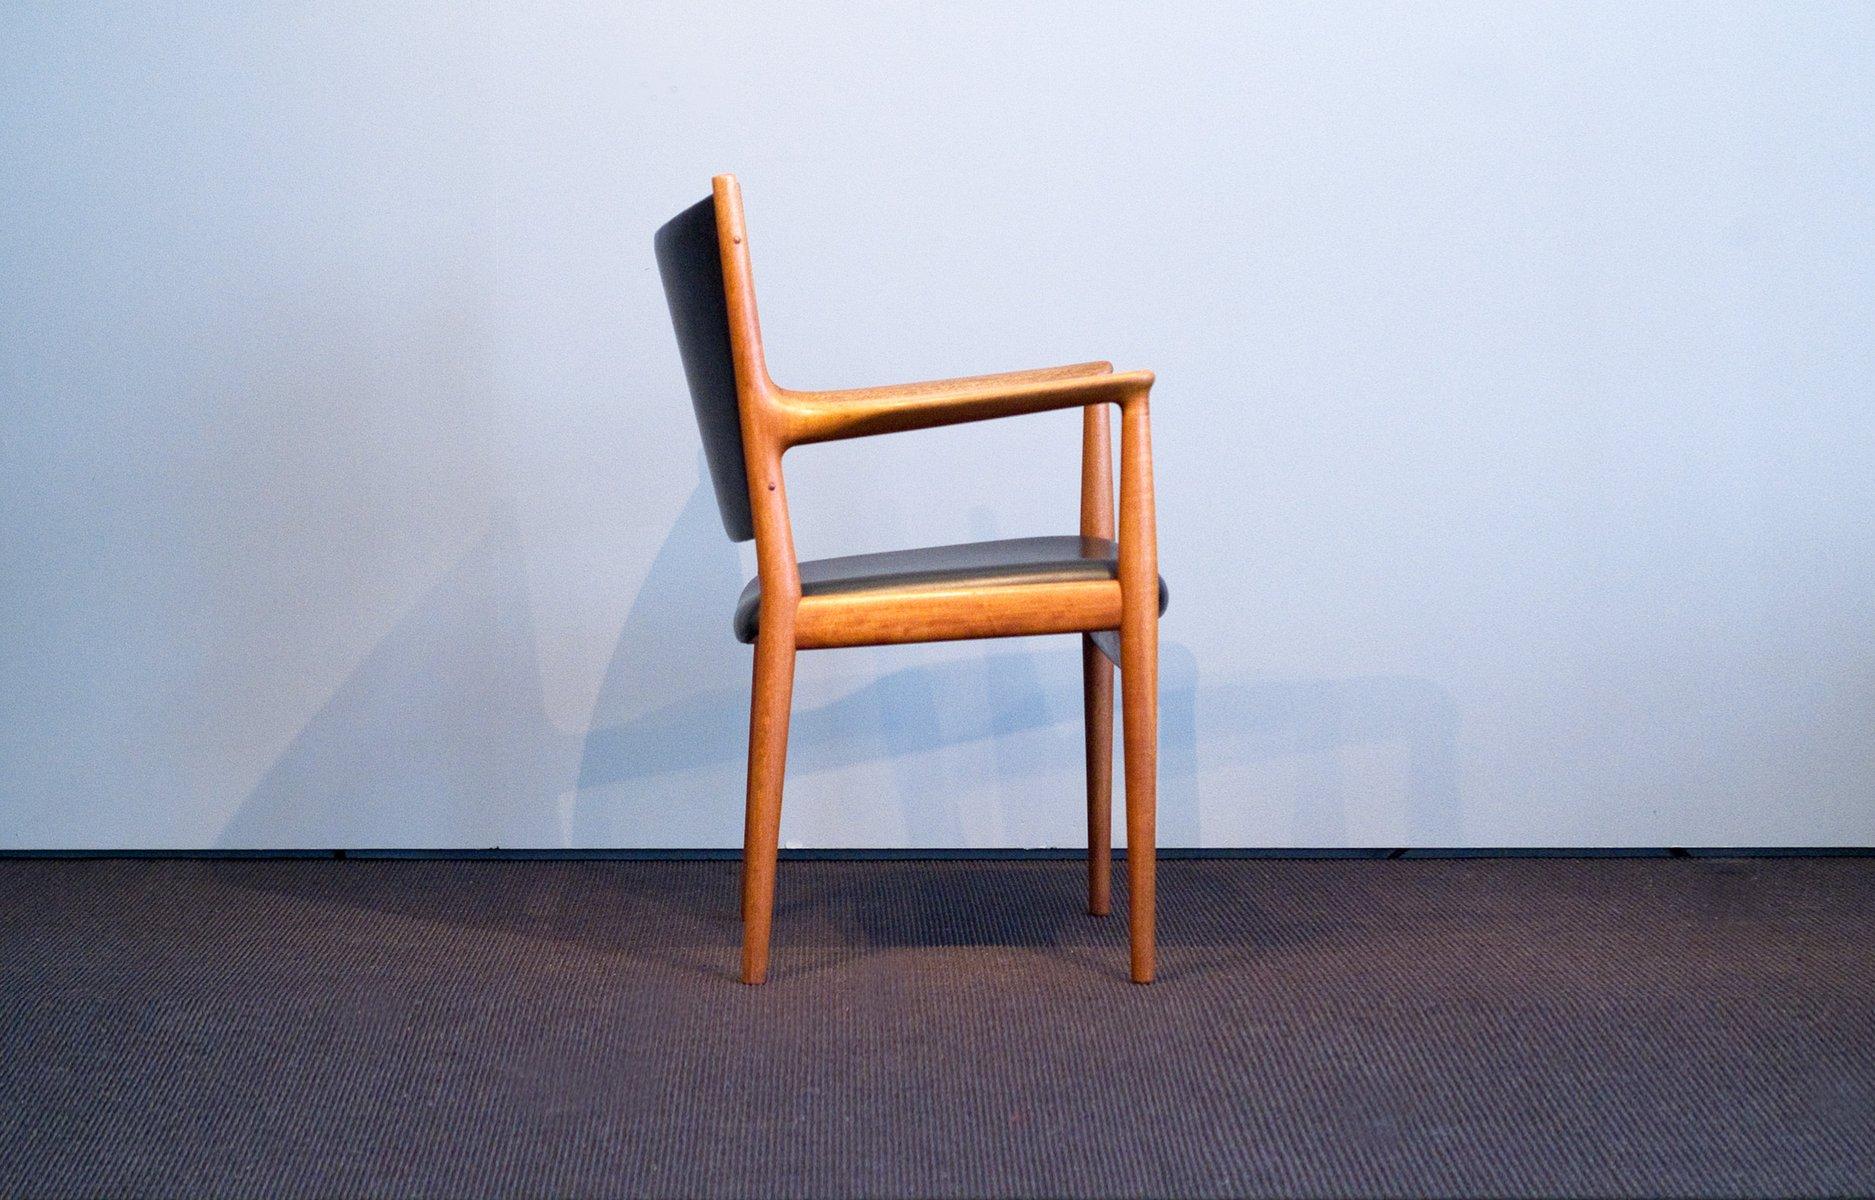 Vintage jh 513 stuhl aus teak leder von hans j wegner f r johannes hansen bei pamono kaufen - Vintage stuhl leder ...